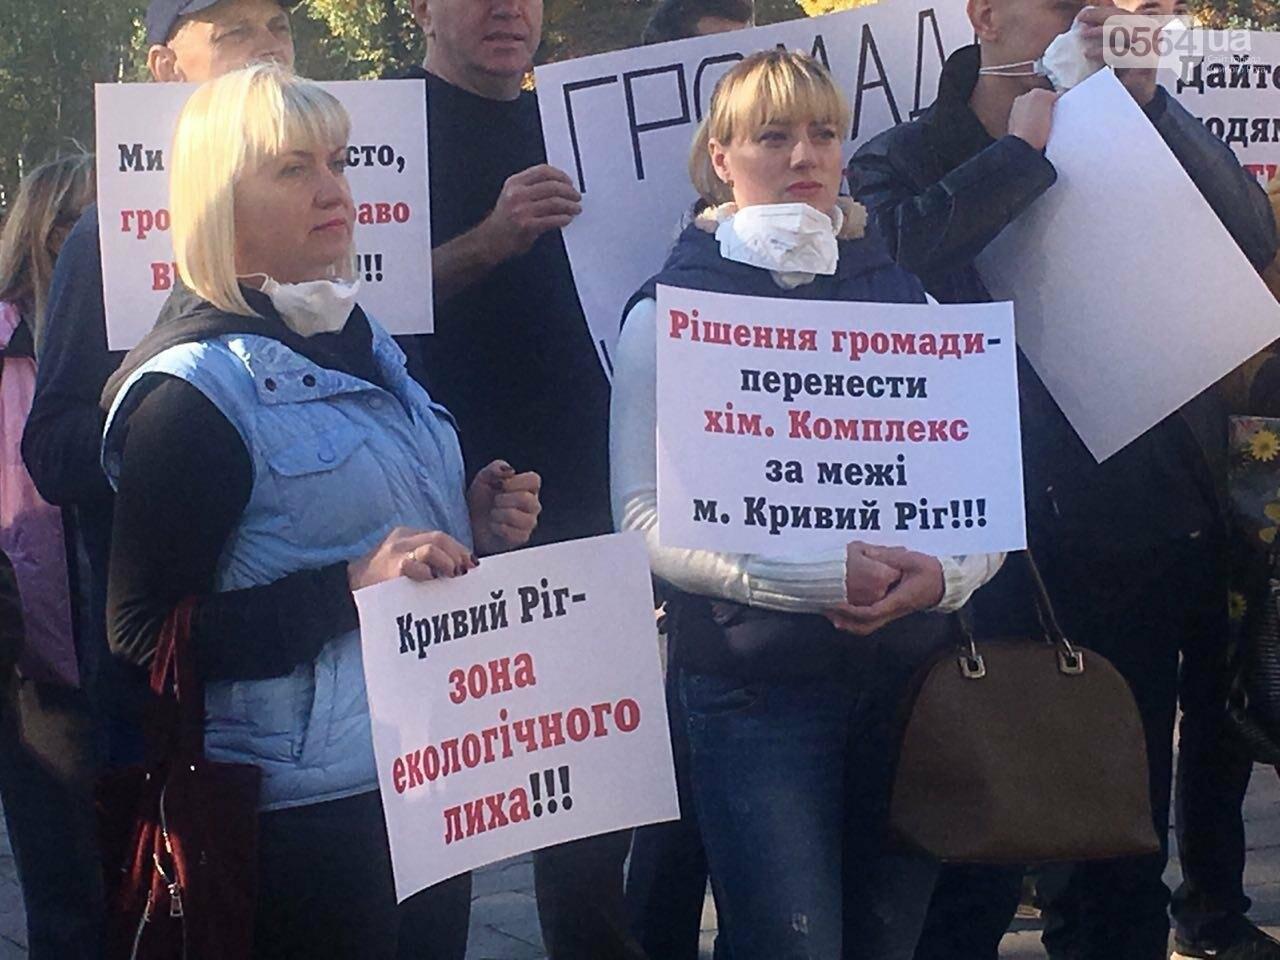 """Я хочу жить!"": криворожане митингуют под горисполкомом, - ФОТО, ВИДЕО, фото-3"